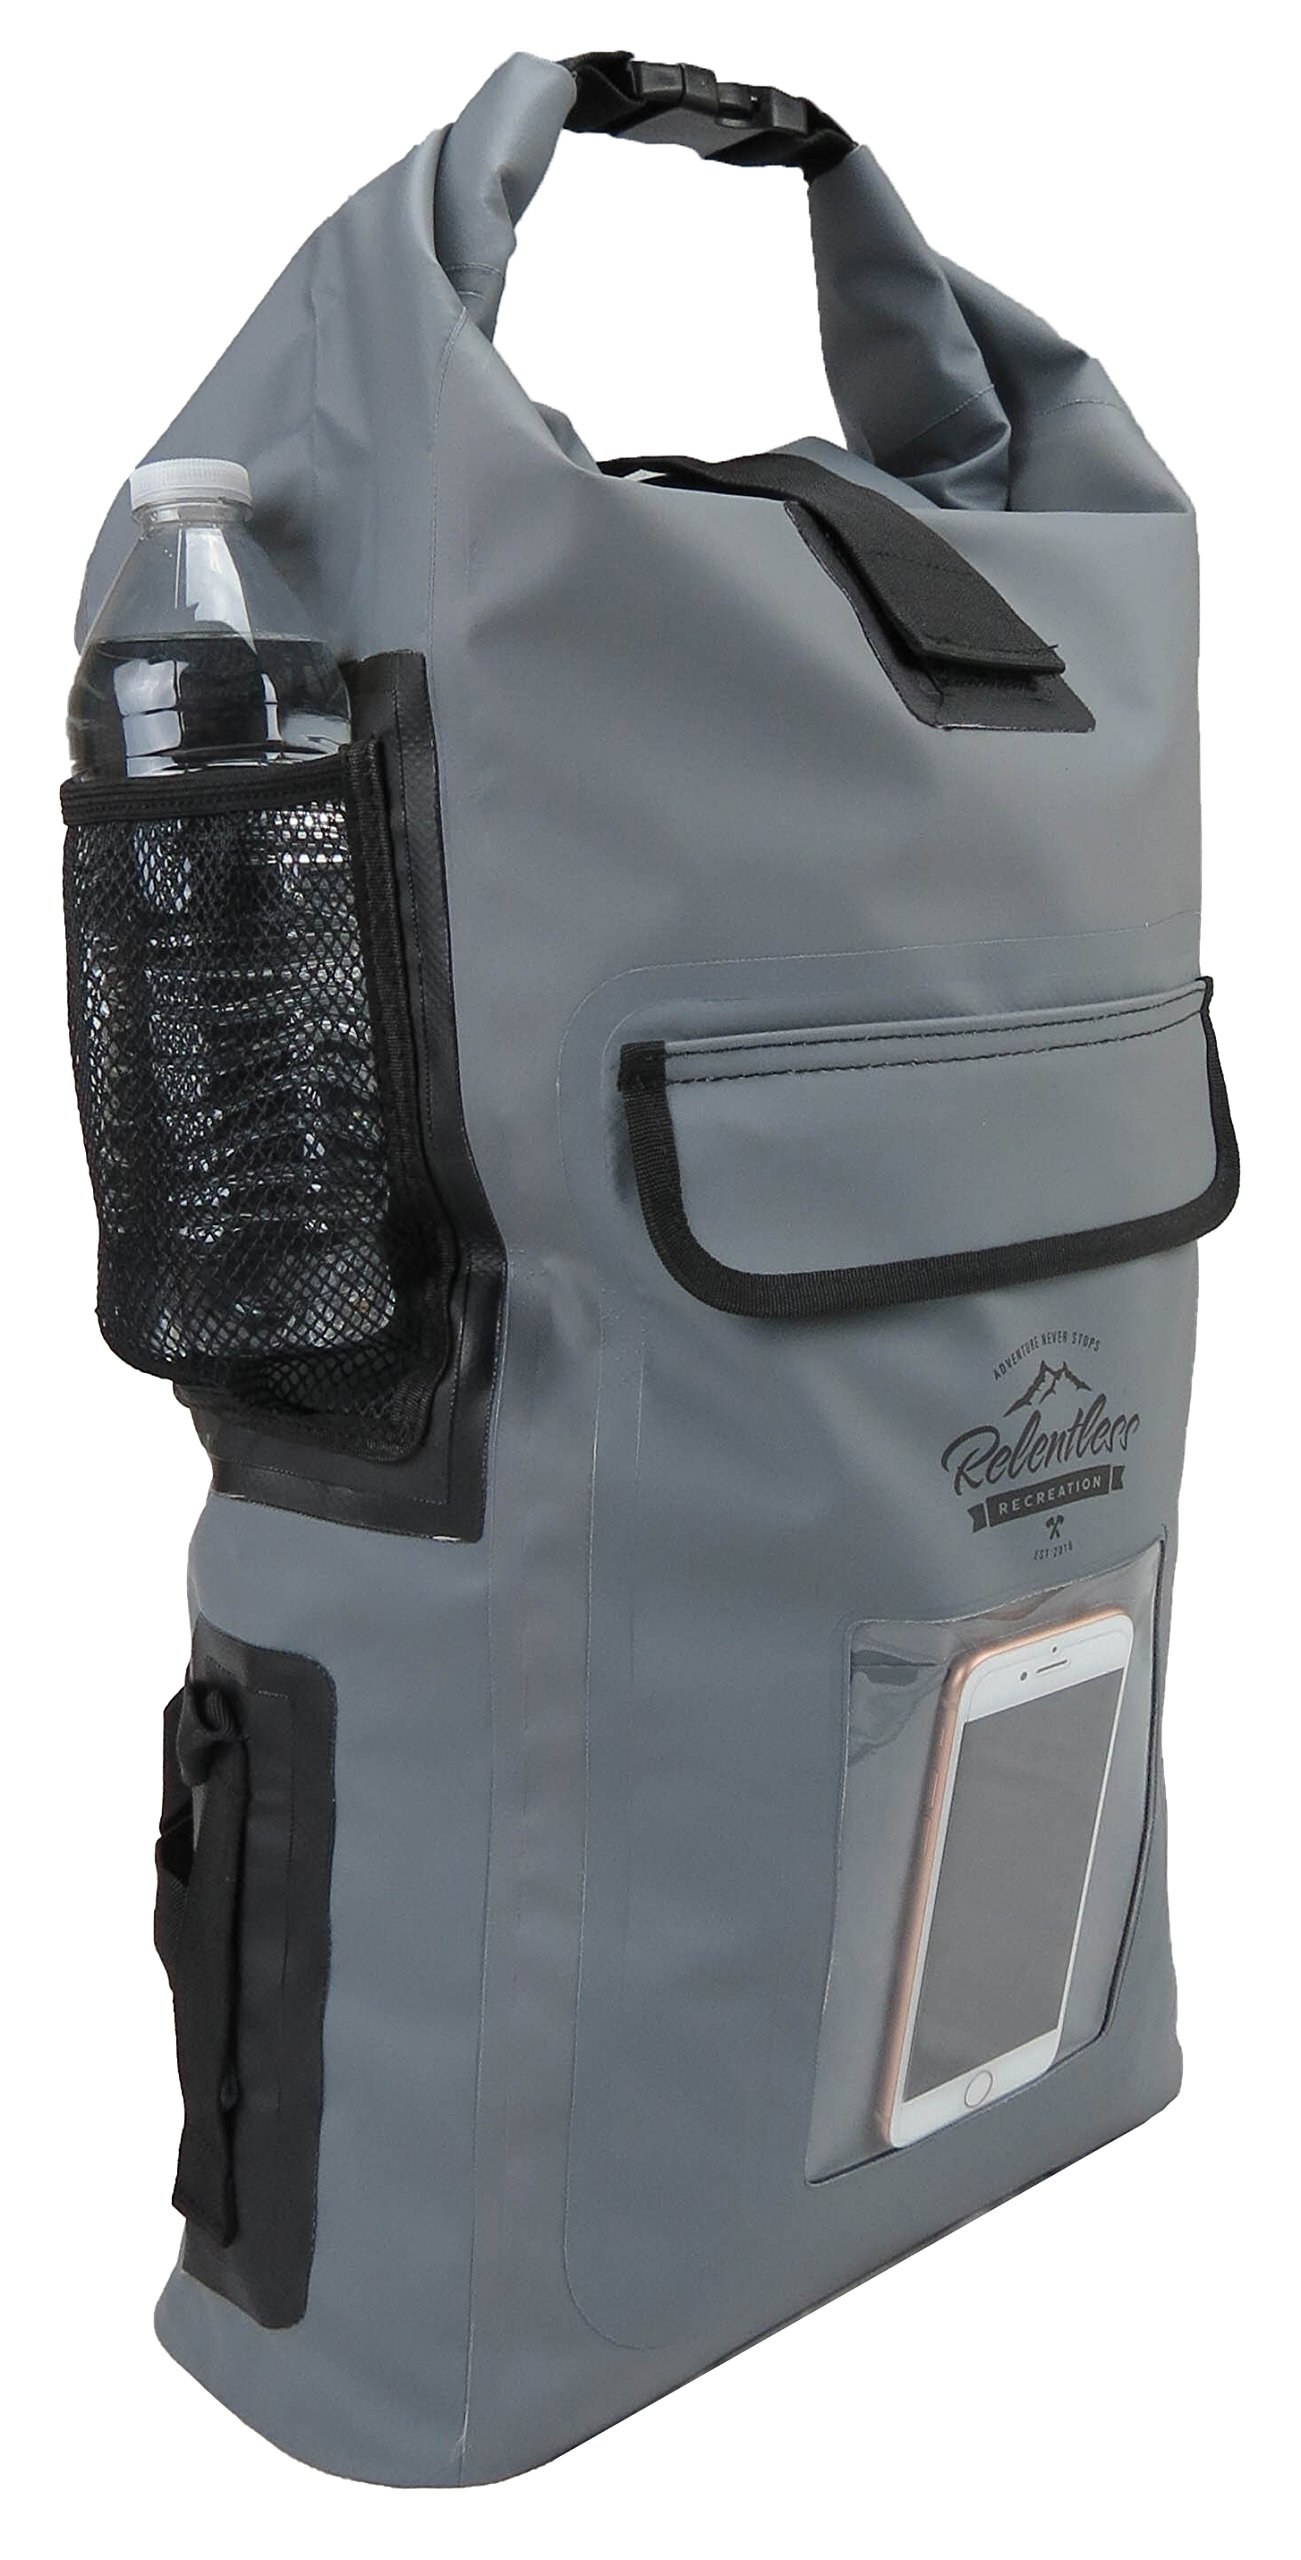 Cheap Tarpaulin Backpack Find Tarpaulin Backpack Deals On Line At Alibaba Com